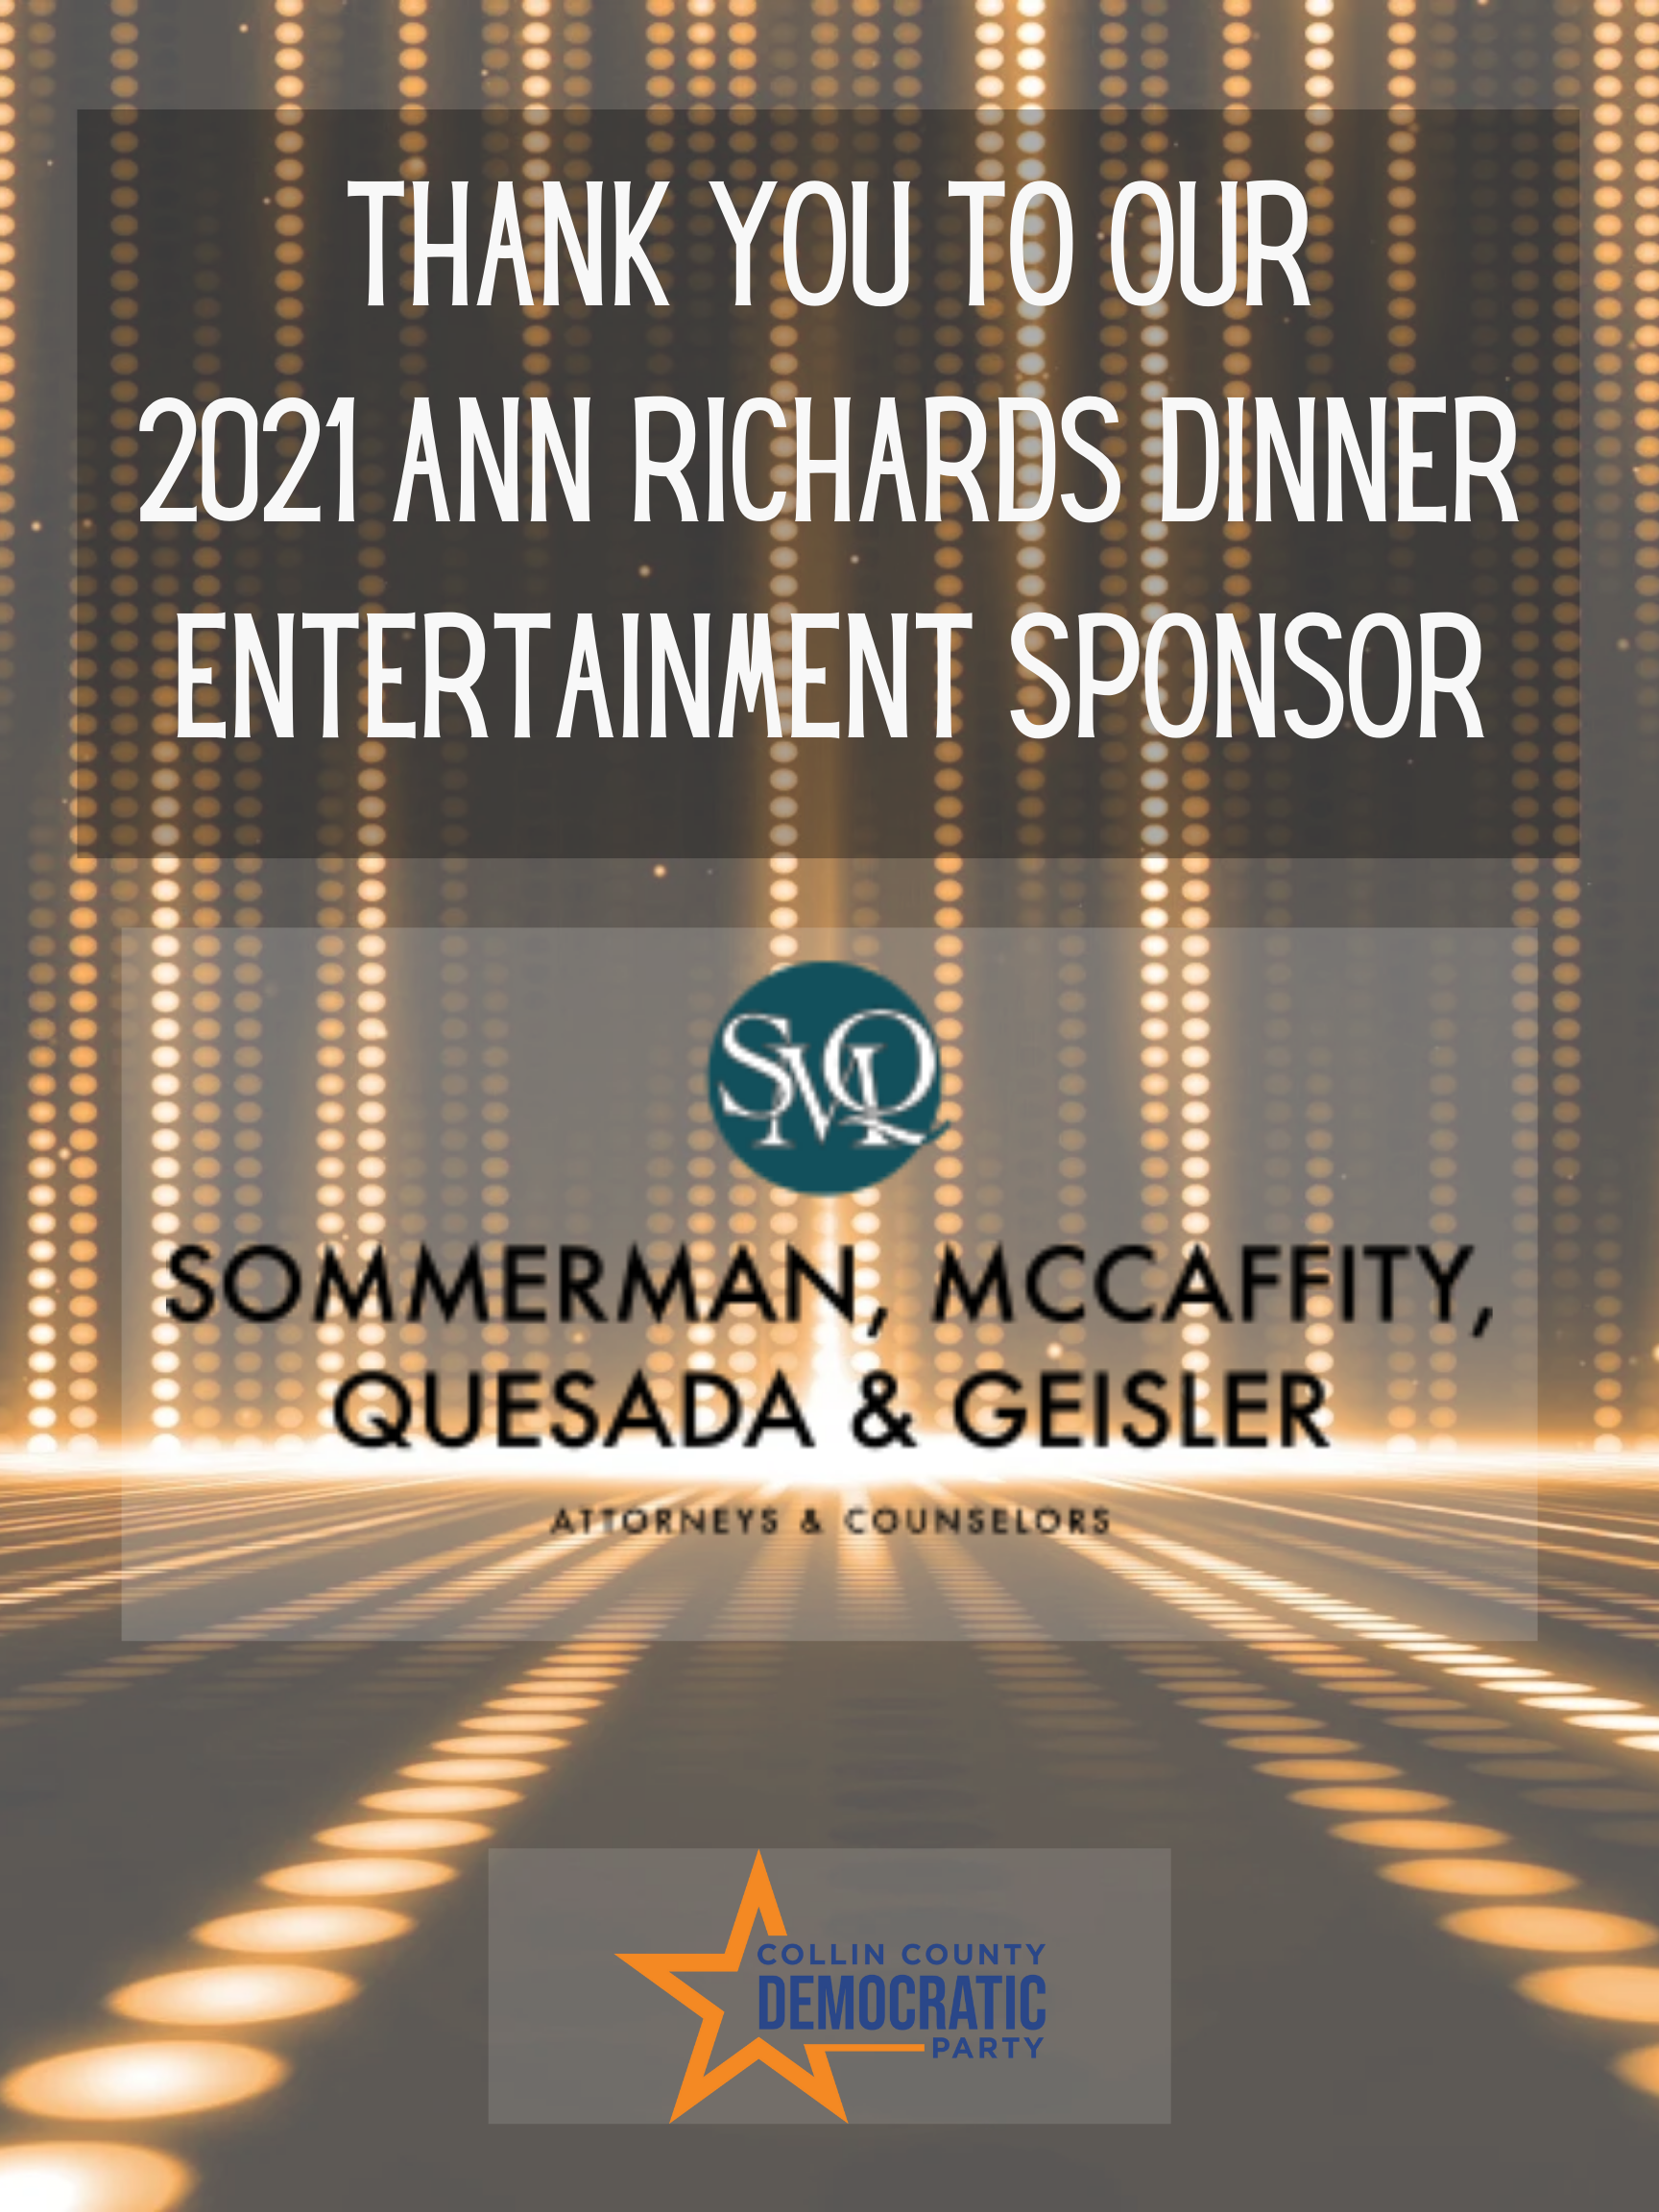 Entertainment Sponsor Sommerman McCaffity Quesada and Geisler